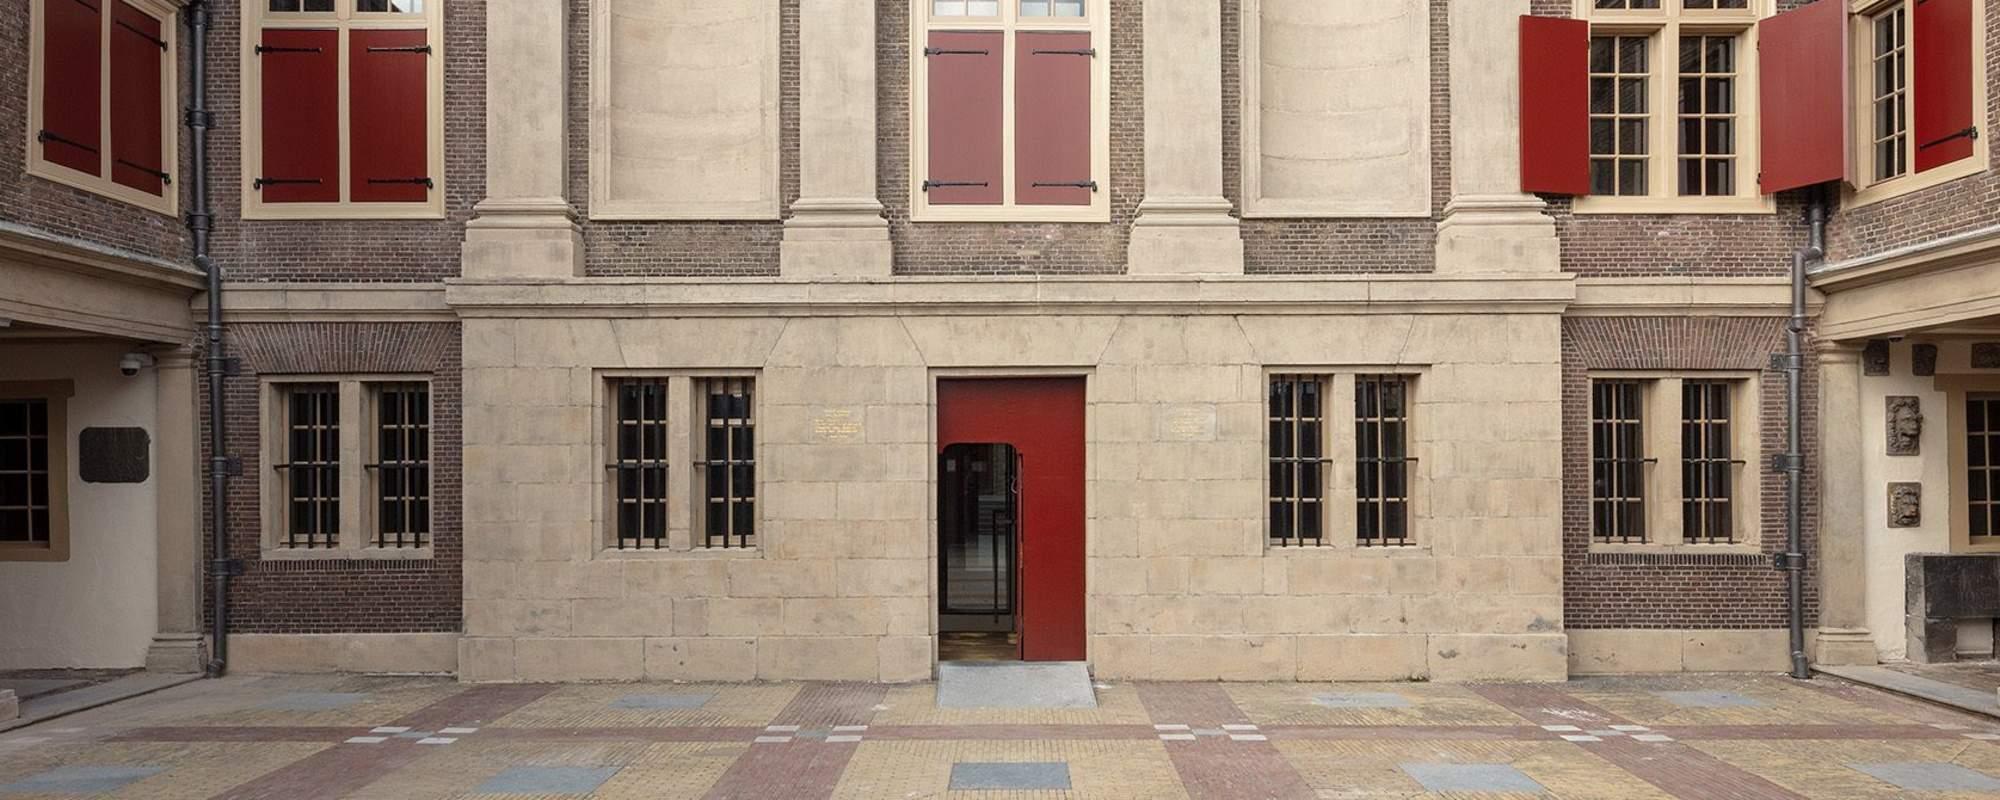 Museum De Lakenhal 4639 40